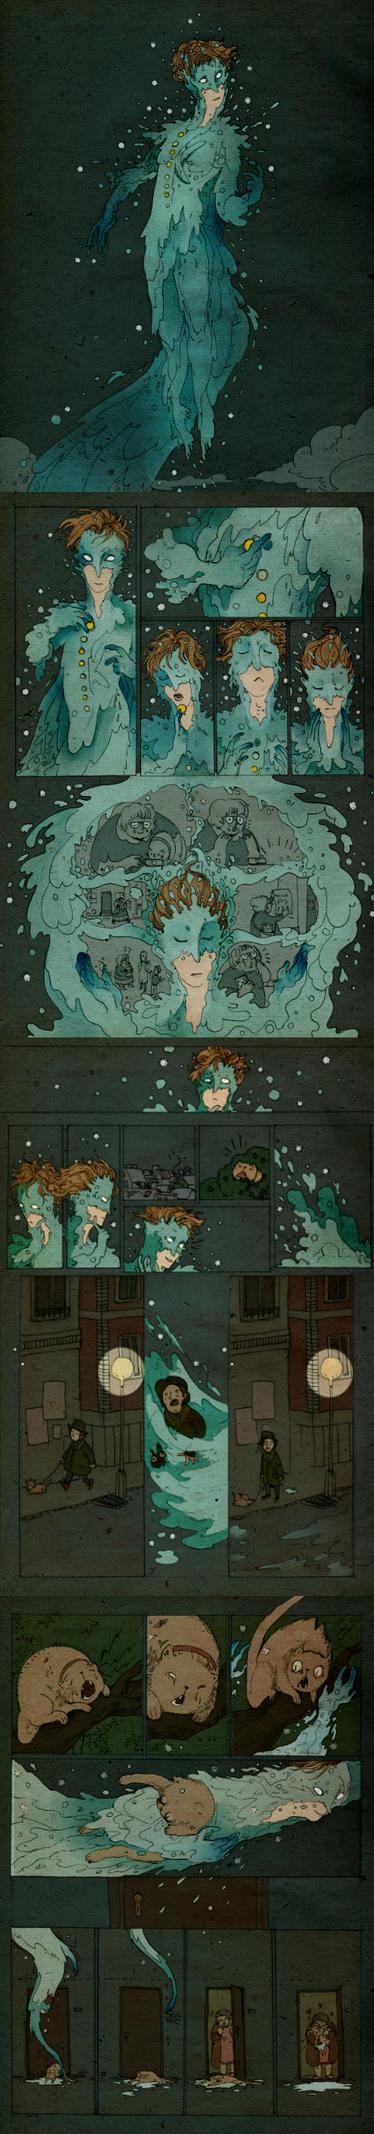 fountain 2 by faQy